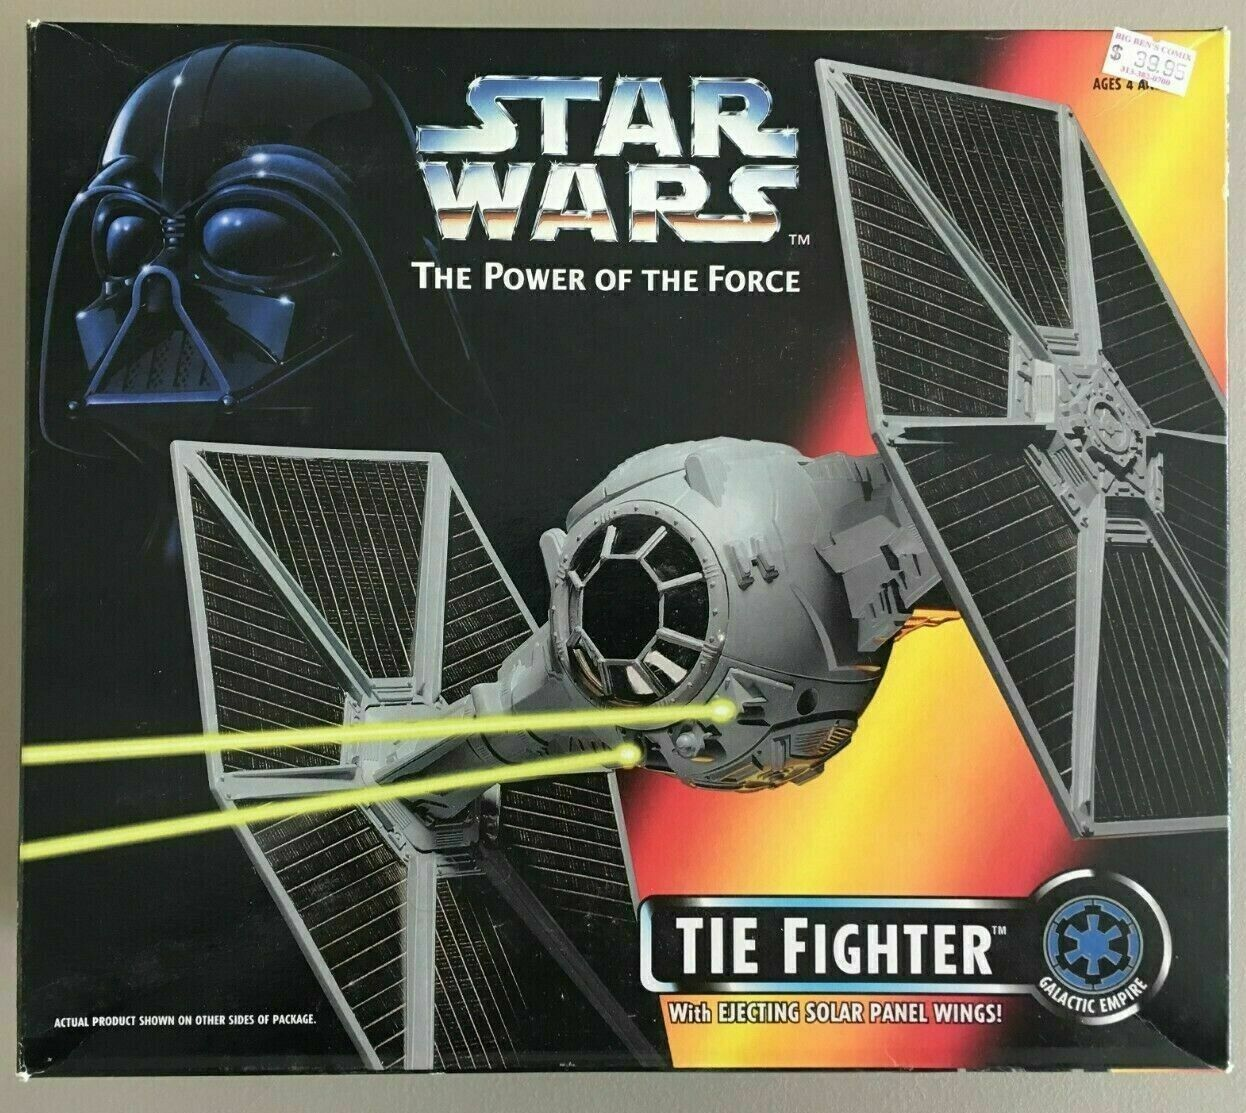 1995 Kenner estrella guerras energia of the Force Tie combatiente Vehicle Sealed completare scatola